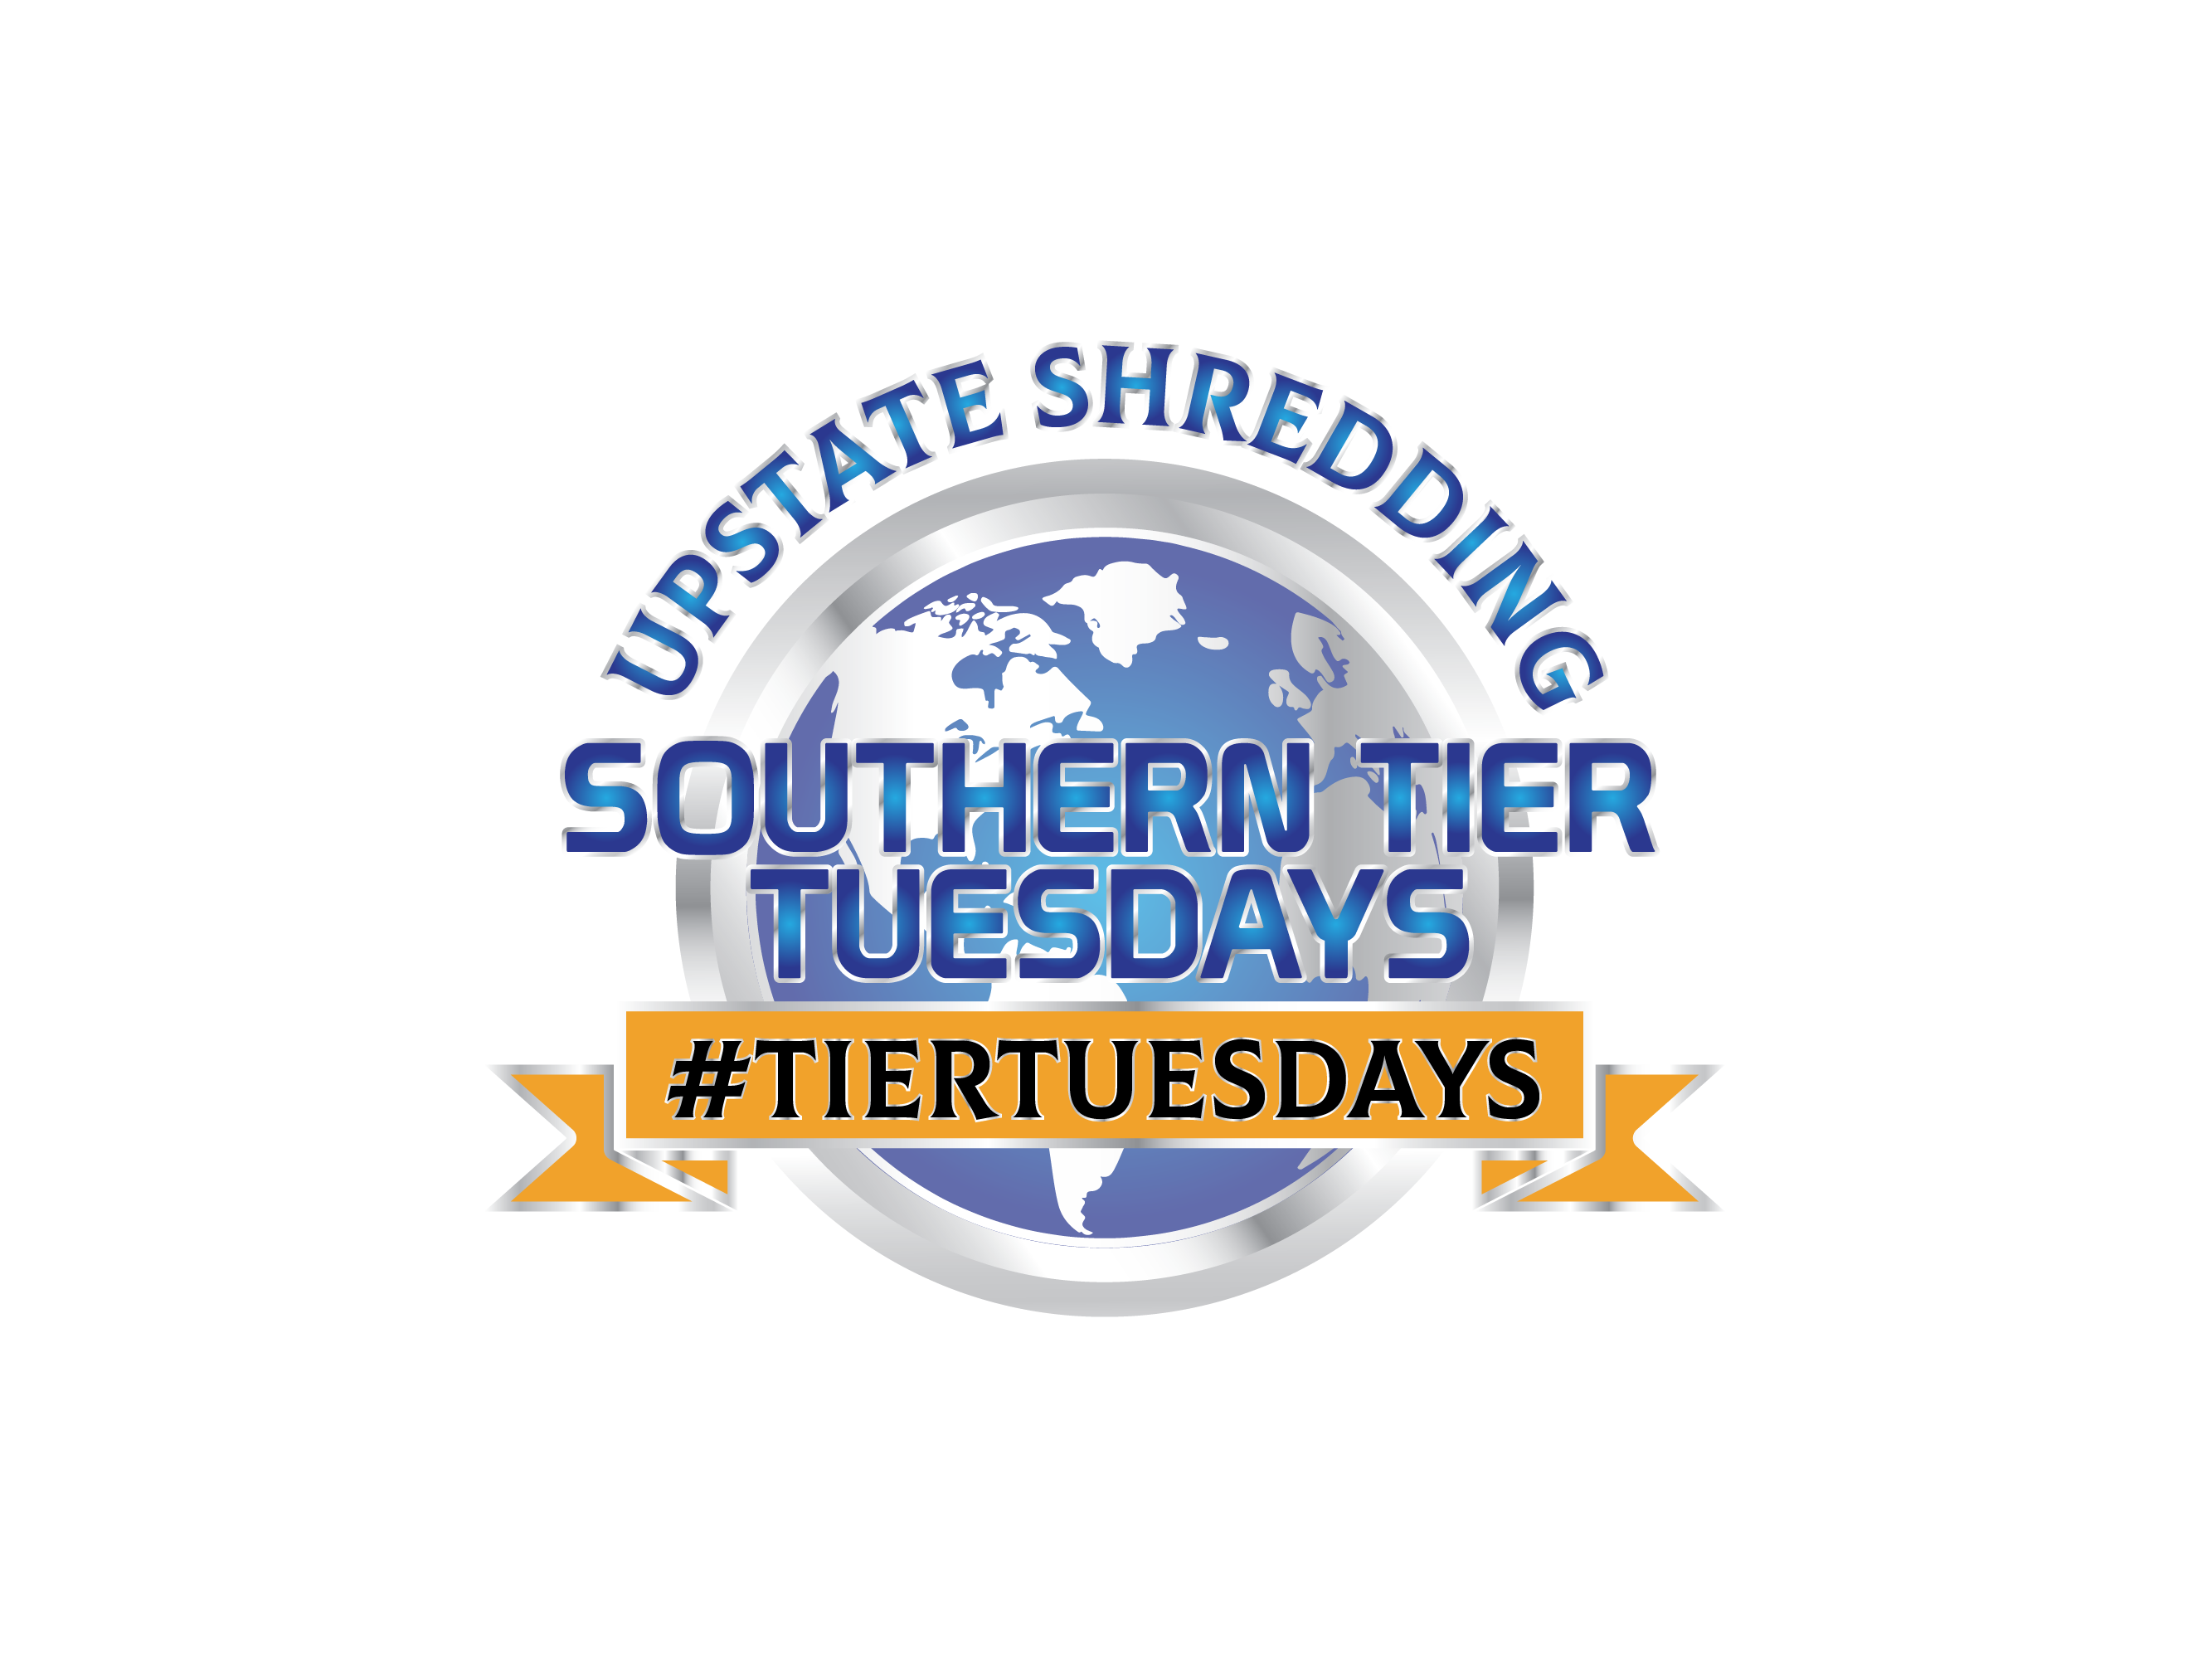 Southern Tier Tuesdays Grant Award